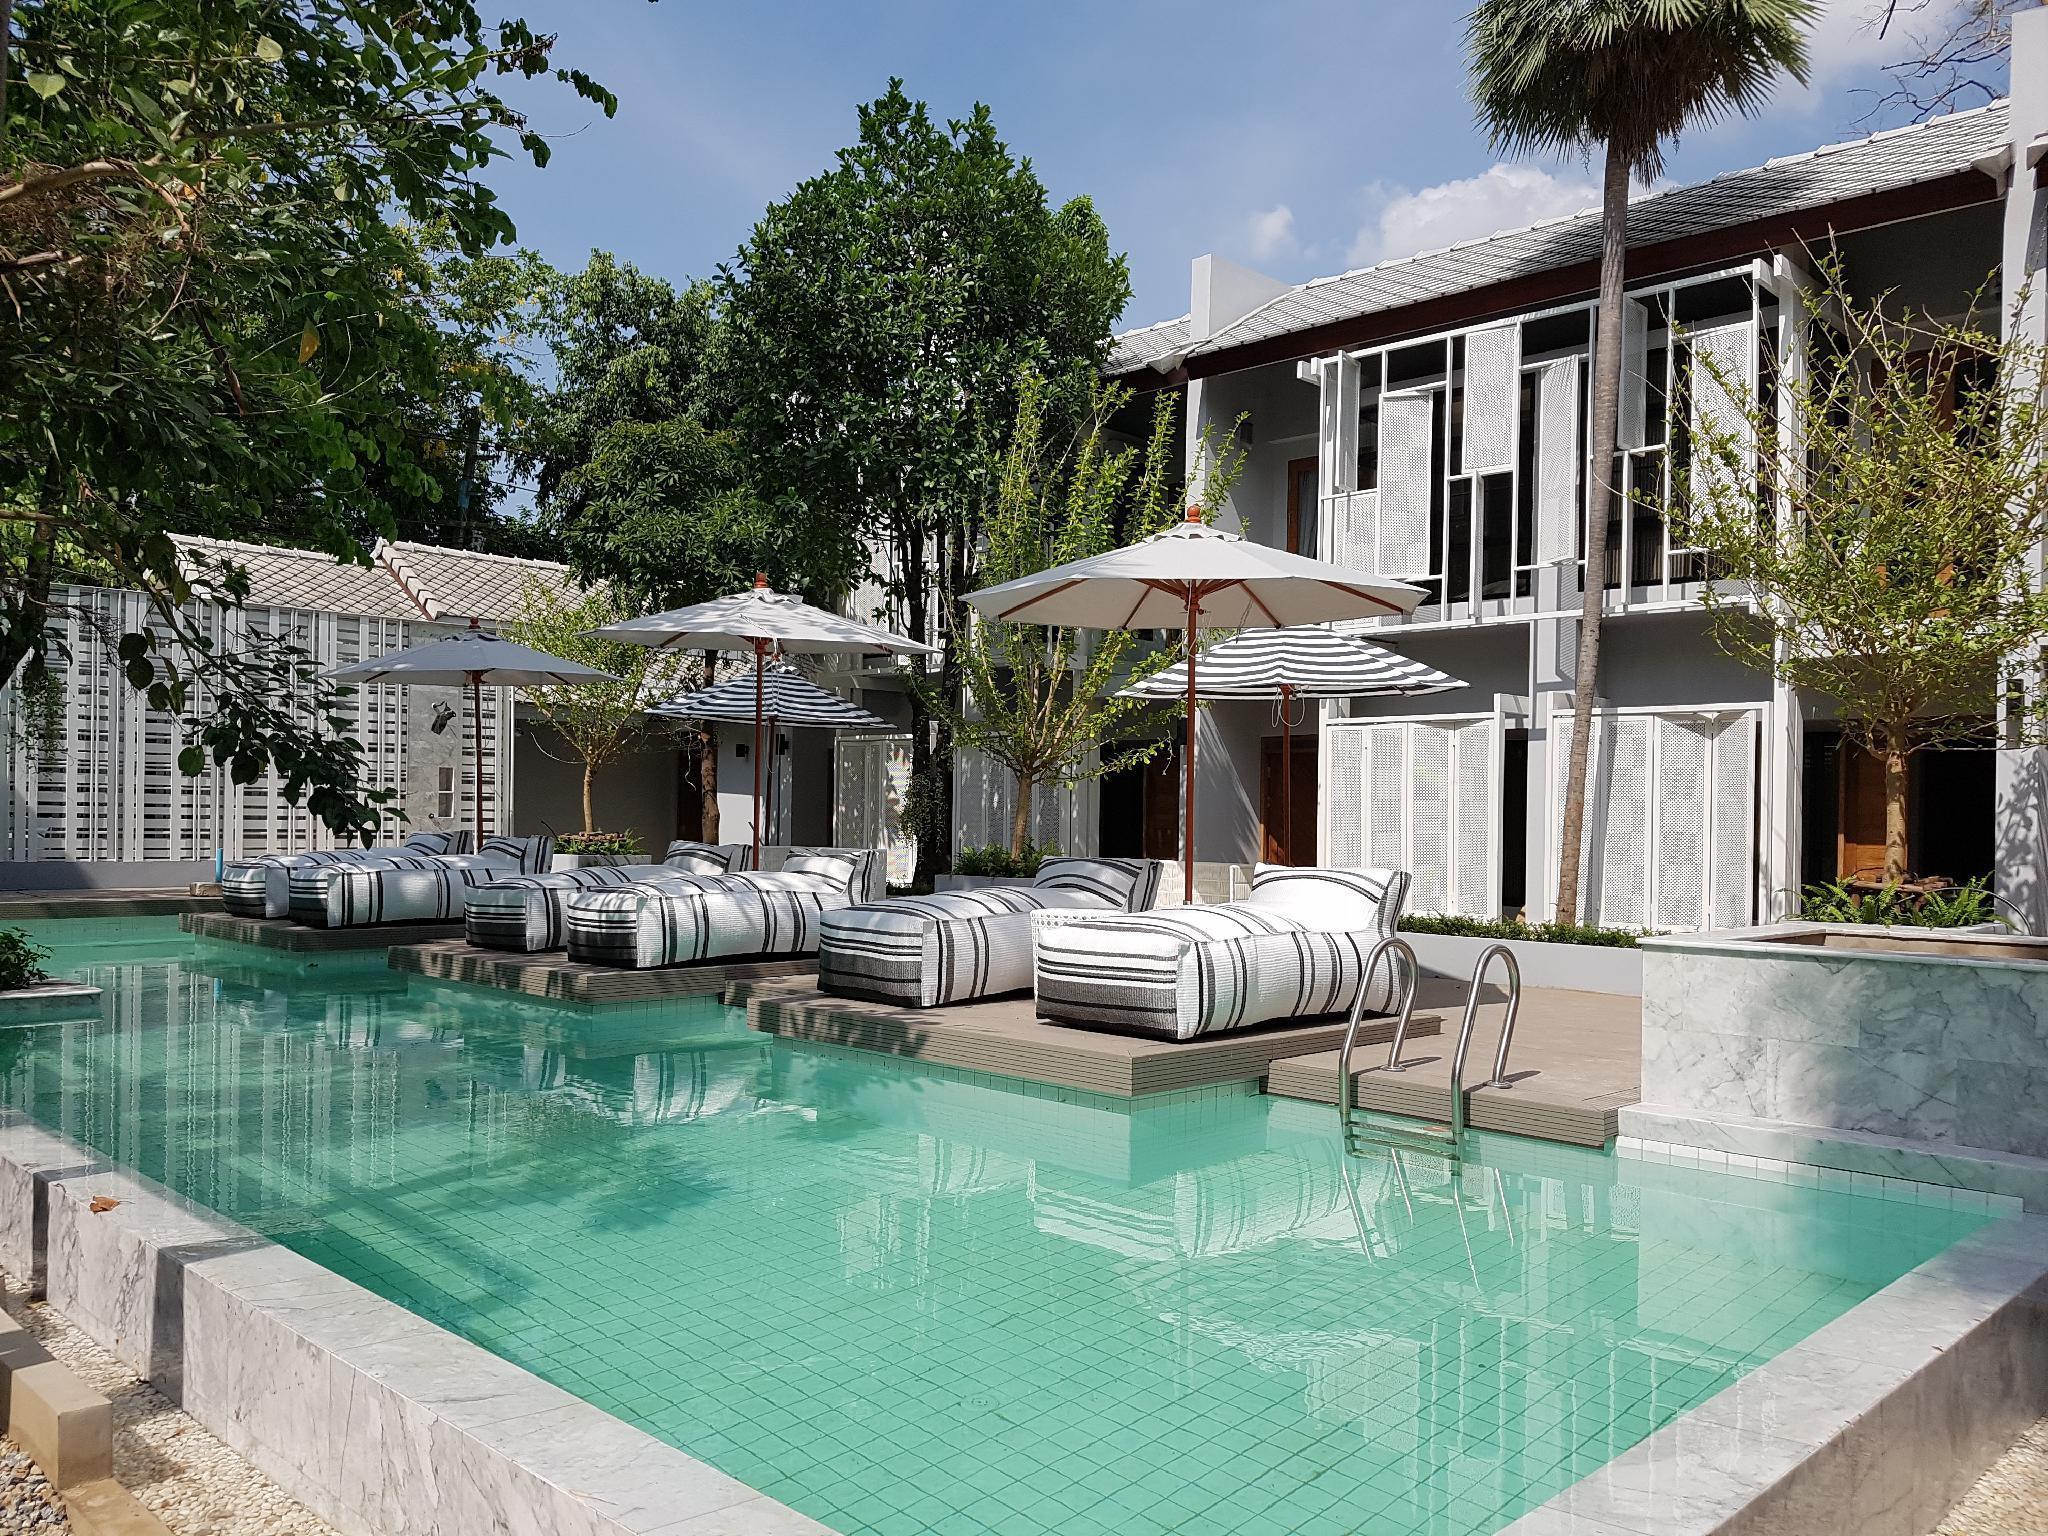 Treevana Club Chiangmai ทรีวนาคลับ เชียงใหม่